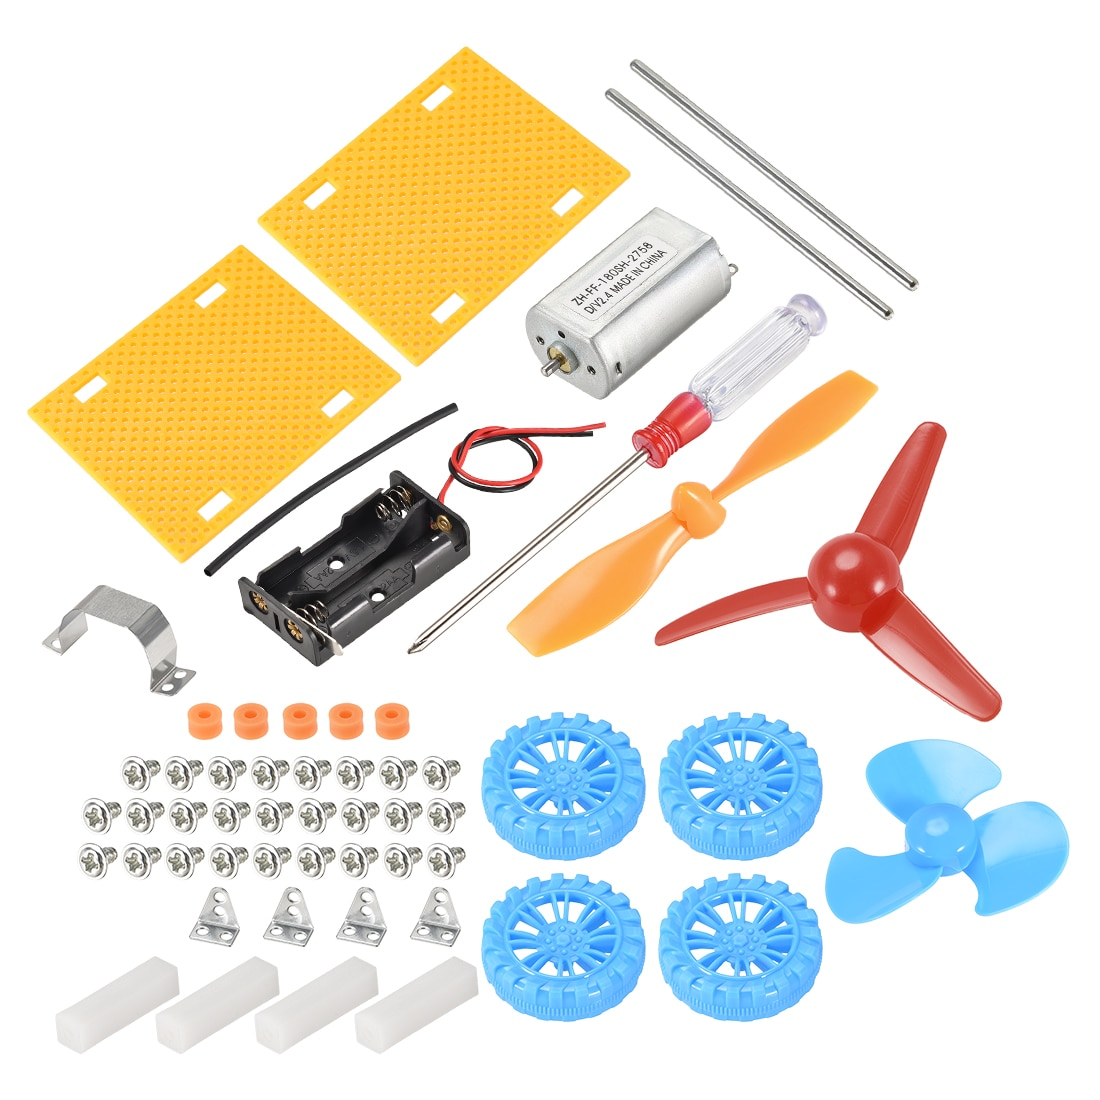 Uxcell DIY Мини Мотор электрические наборы физика электрические цепи